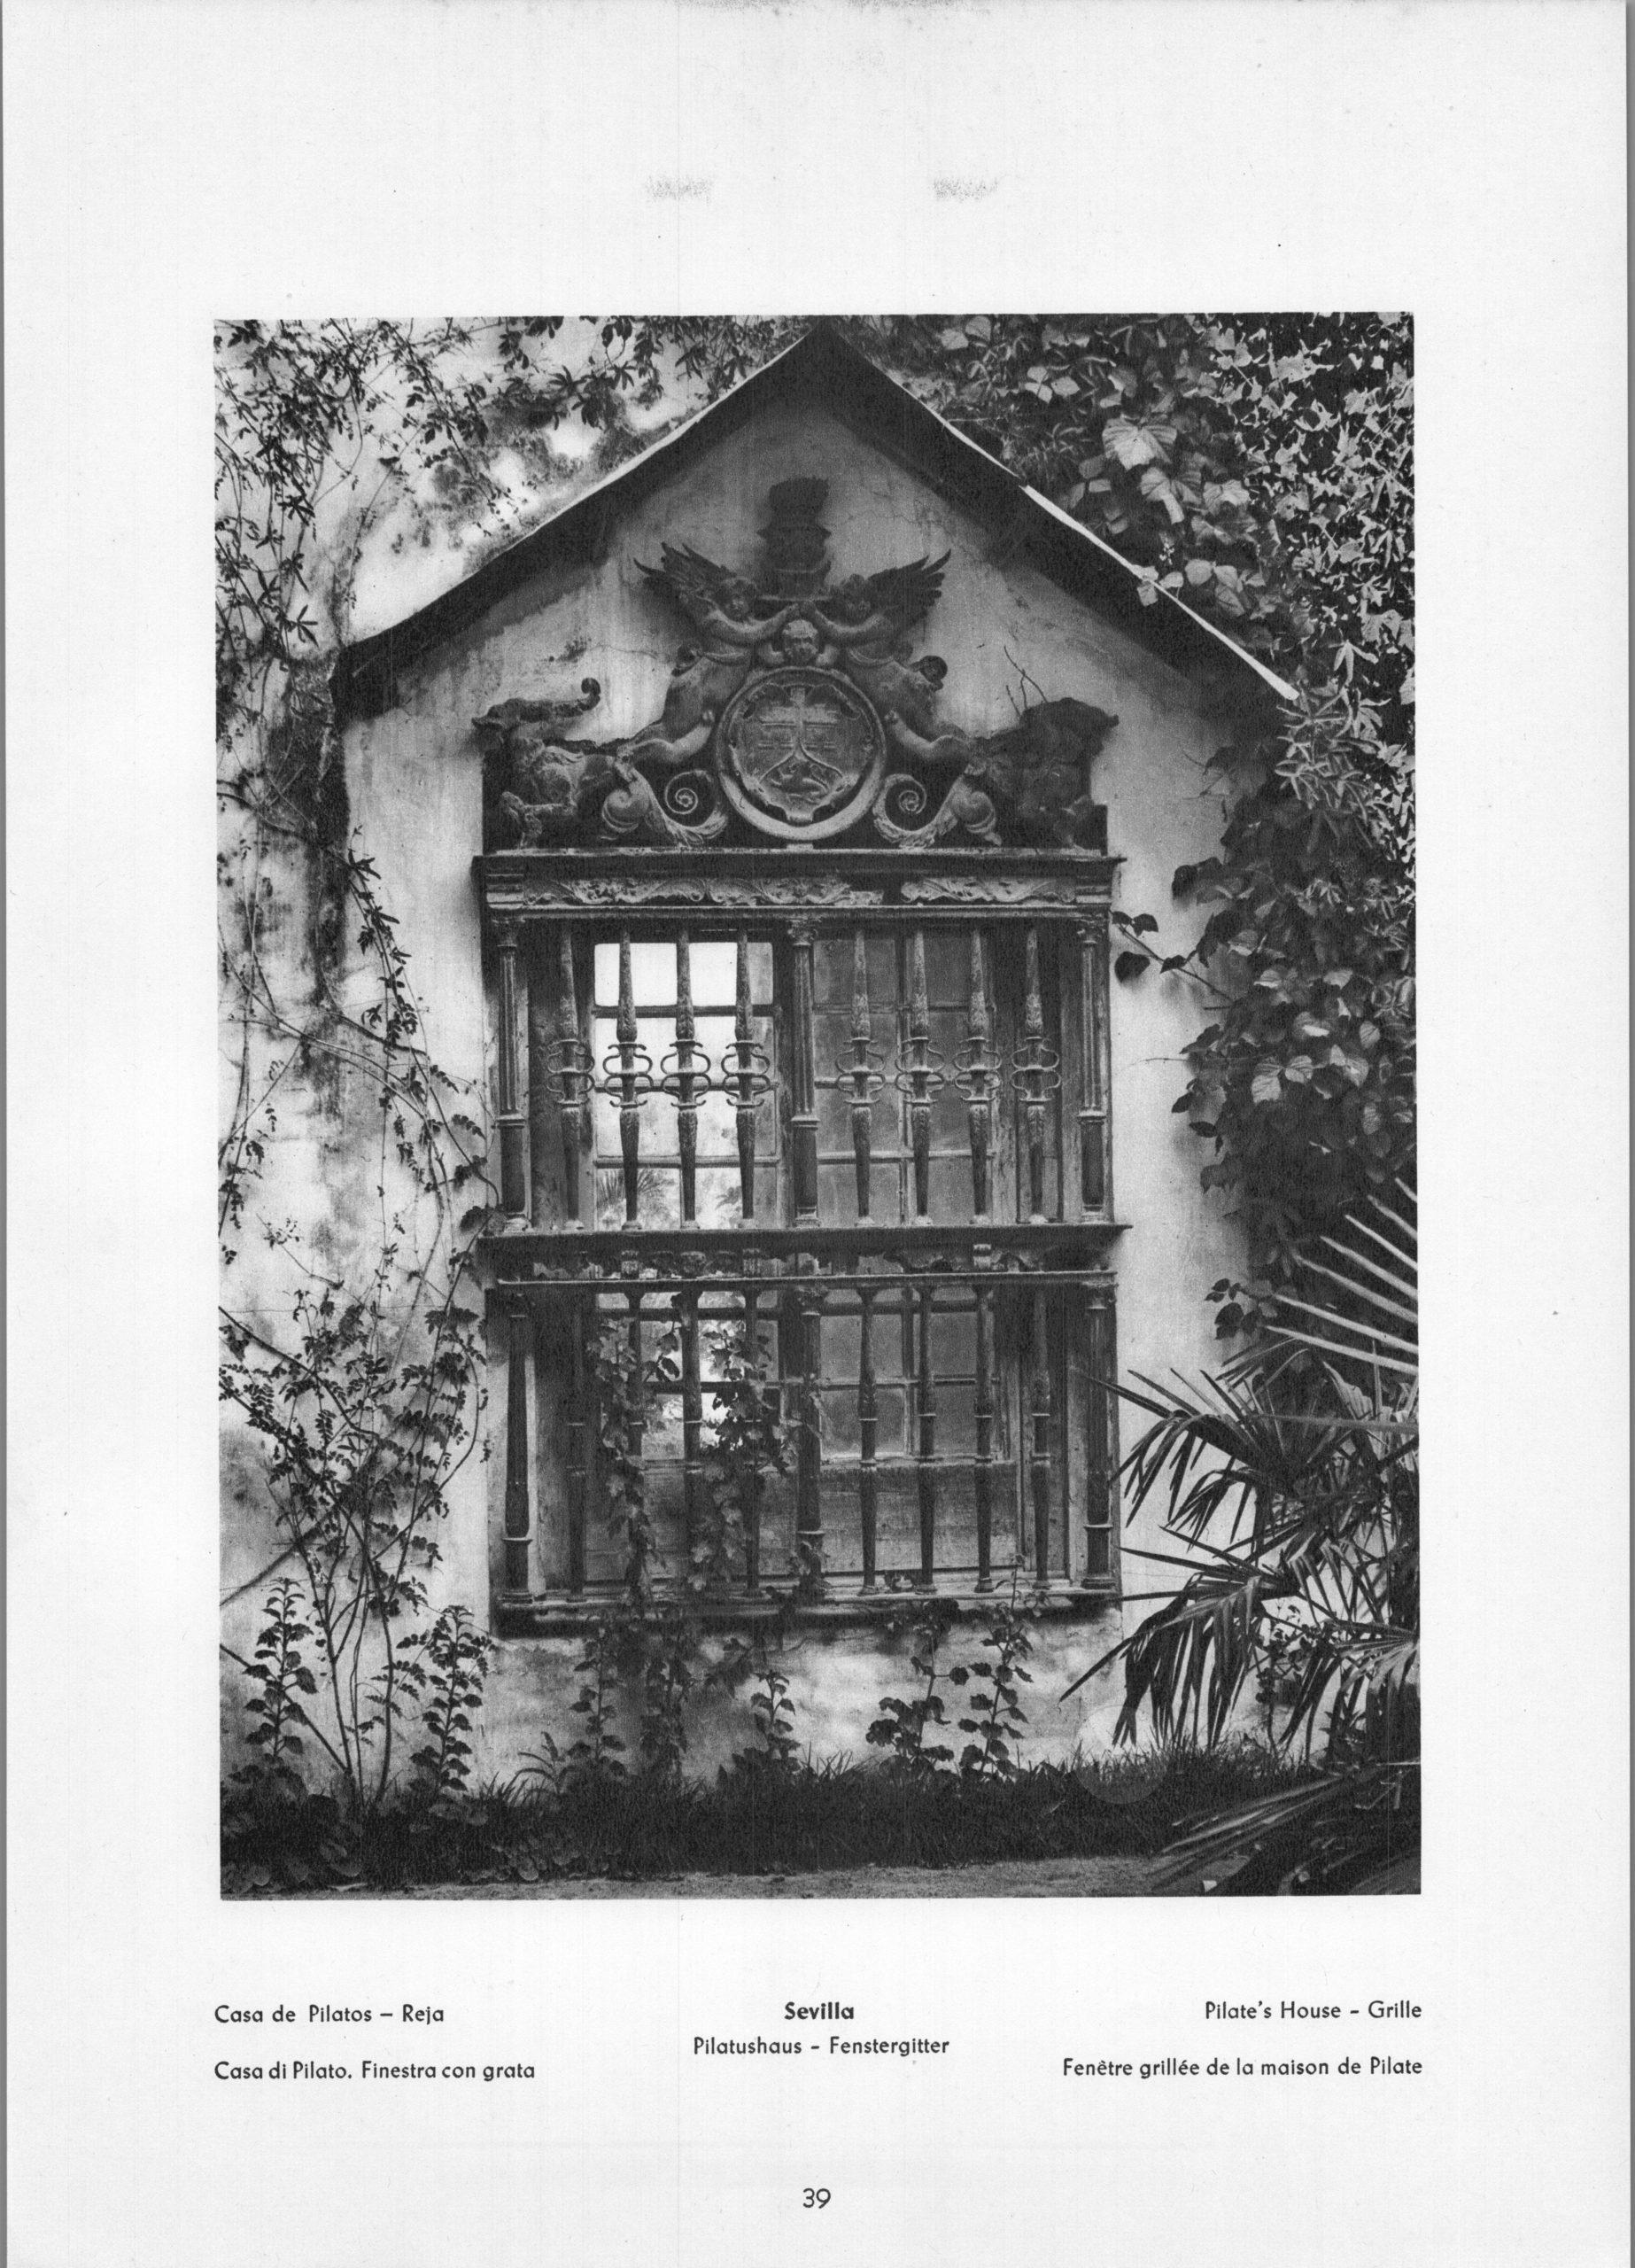 Sevilla - Pilate's House - Grille